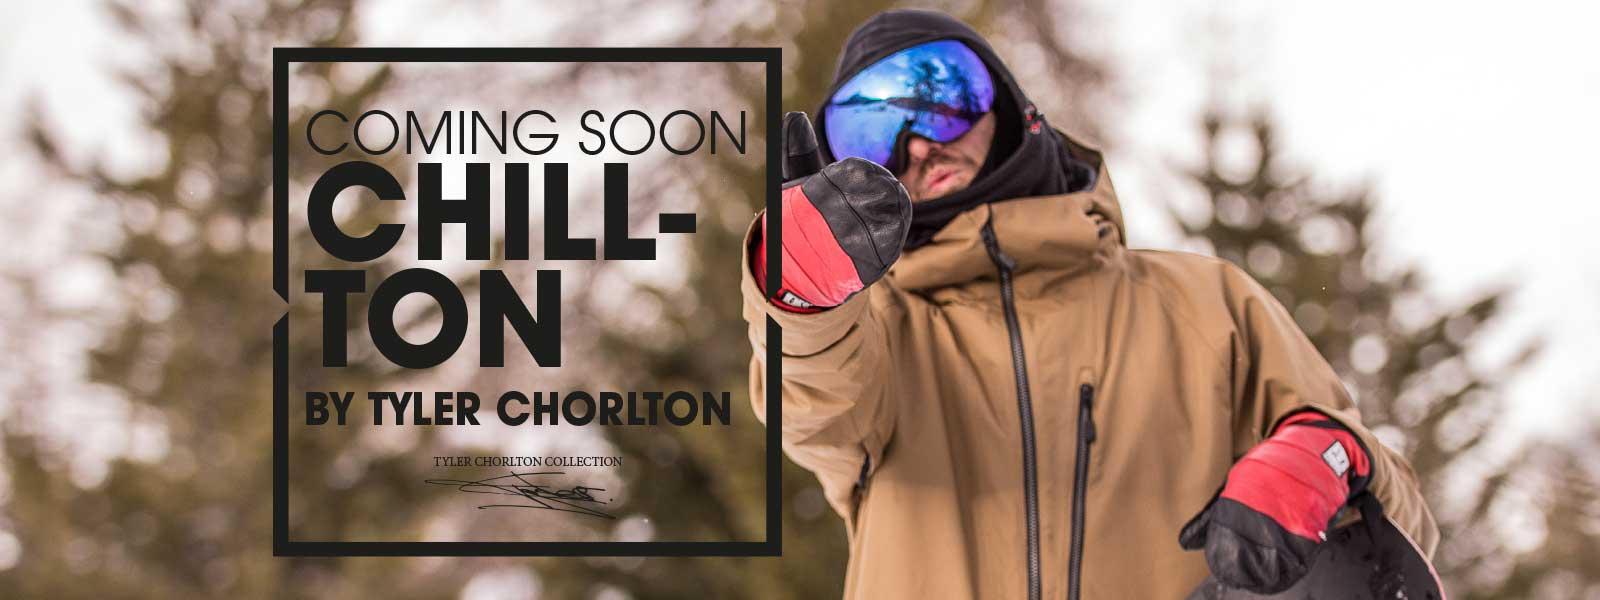 Chillton Coming Soon